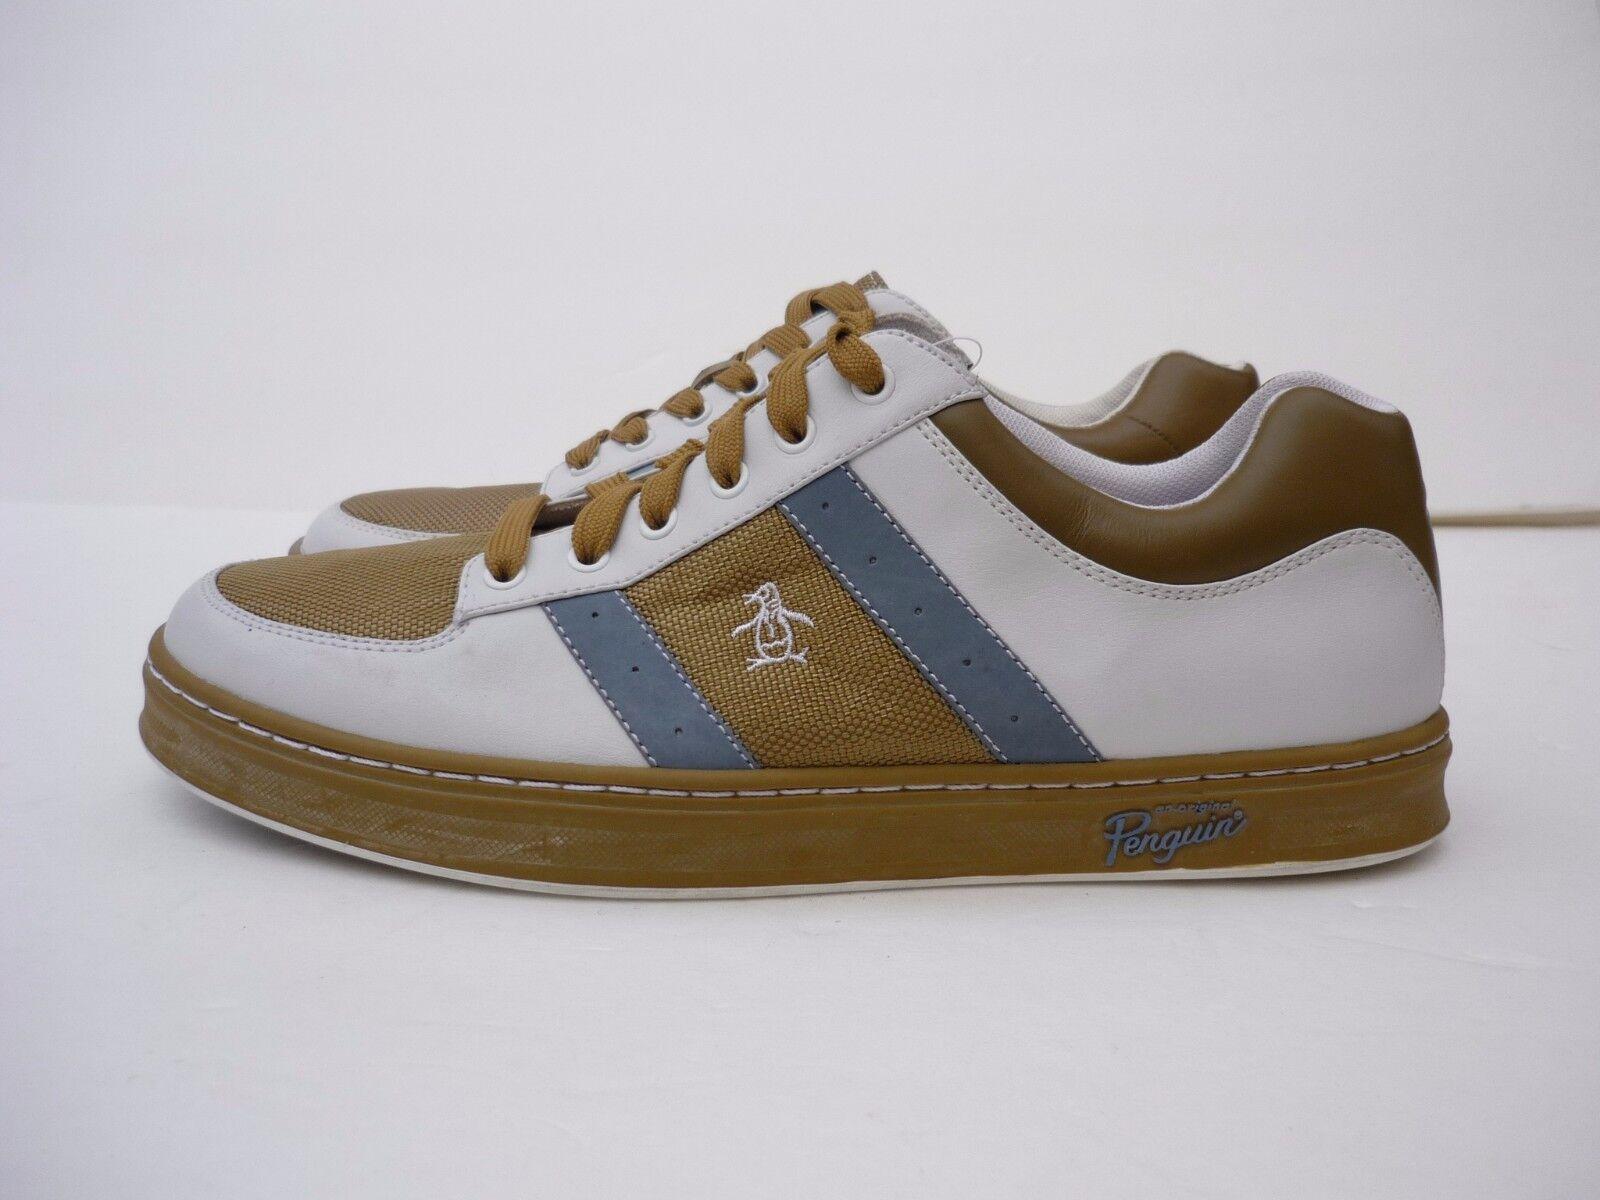 Original Penguin Men's Shoes Jingle Leather Sneakers White Faded Denim Size 9